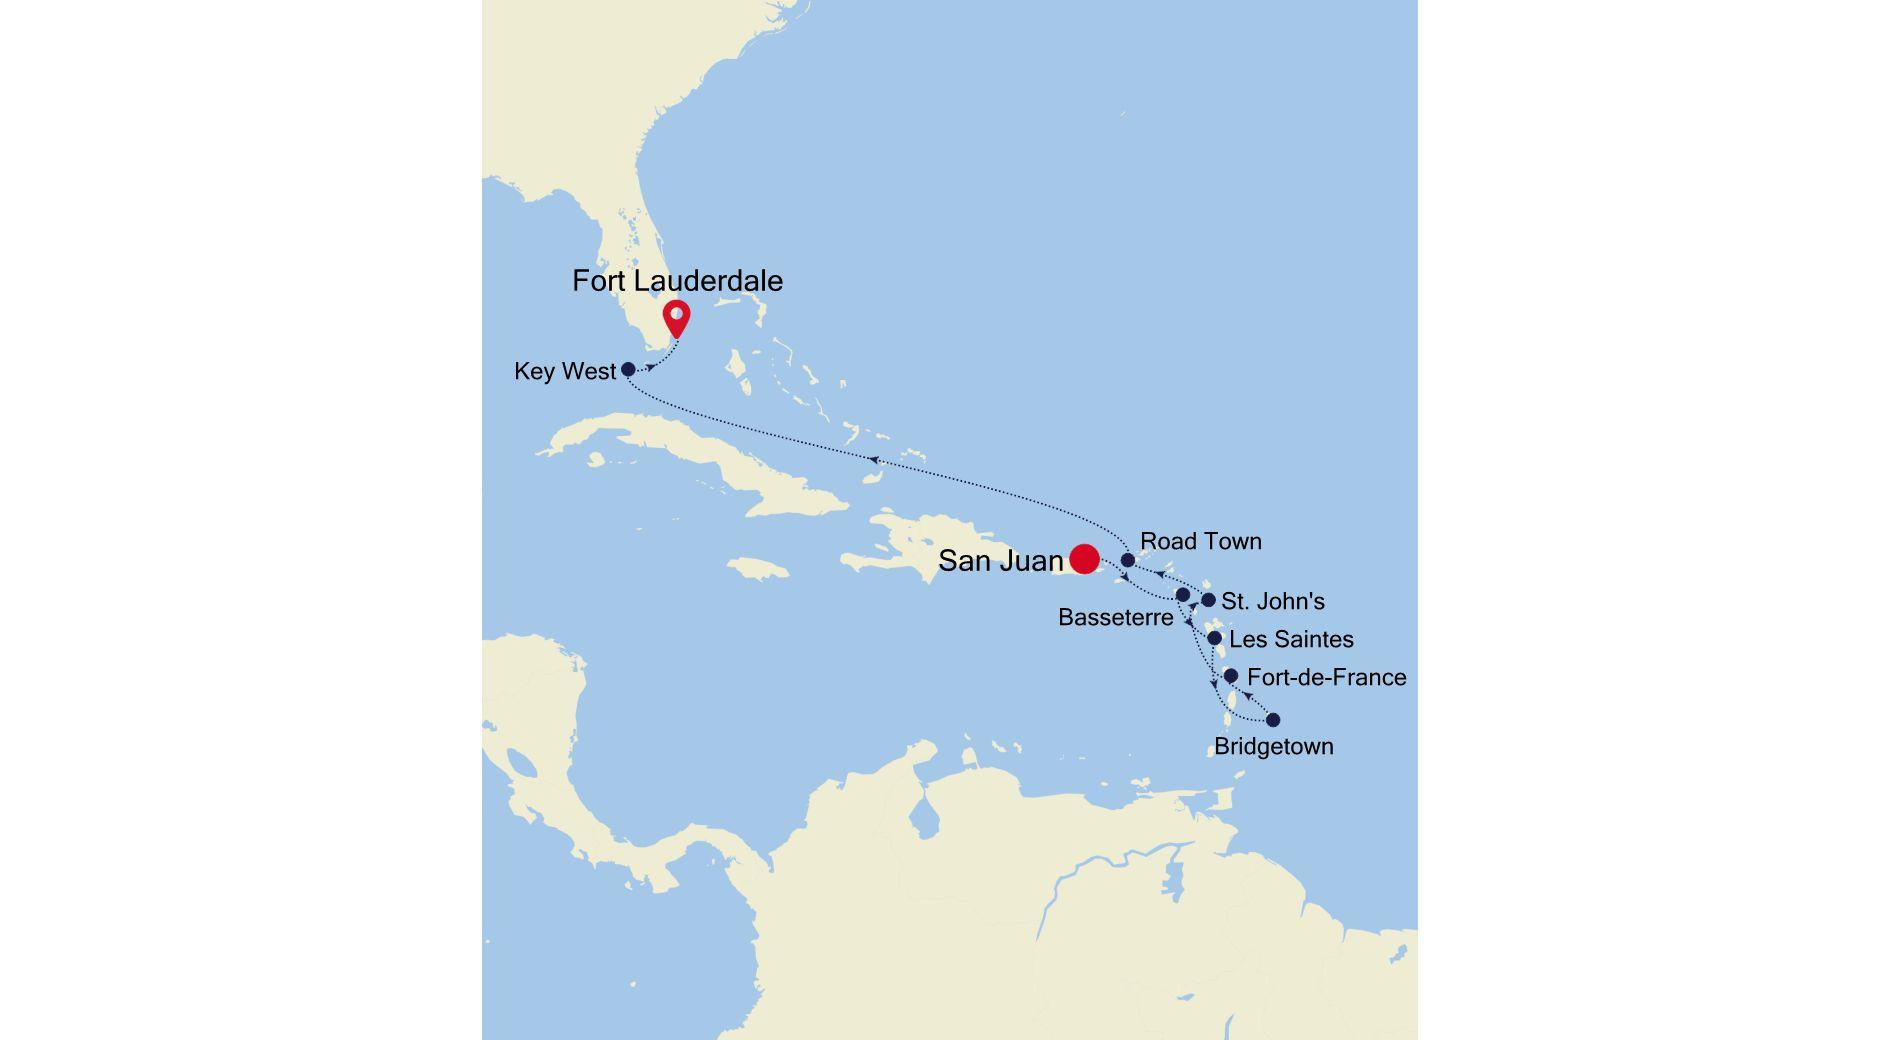 4930C - San Juan a Fort Lauderdale